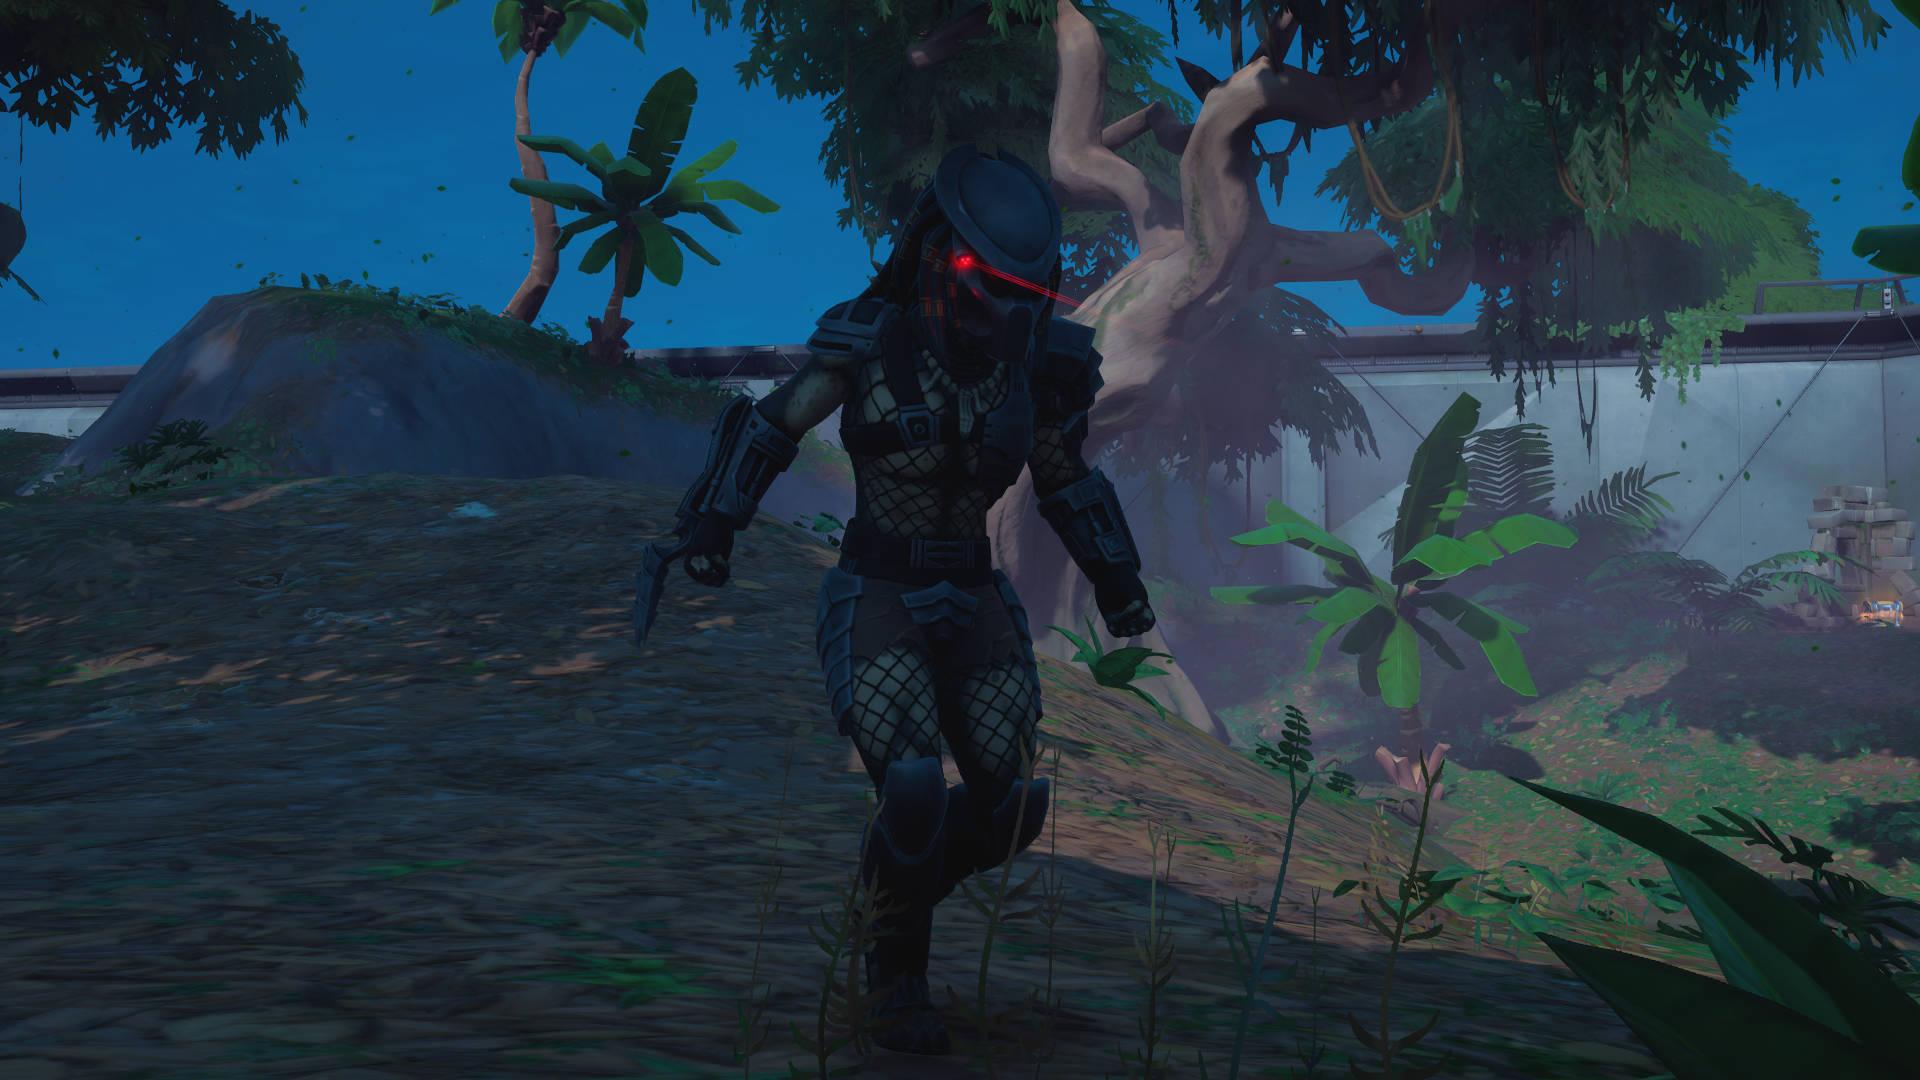 Where is Predator in Fortnite? How to defeat Predator